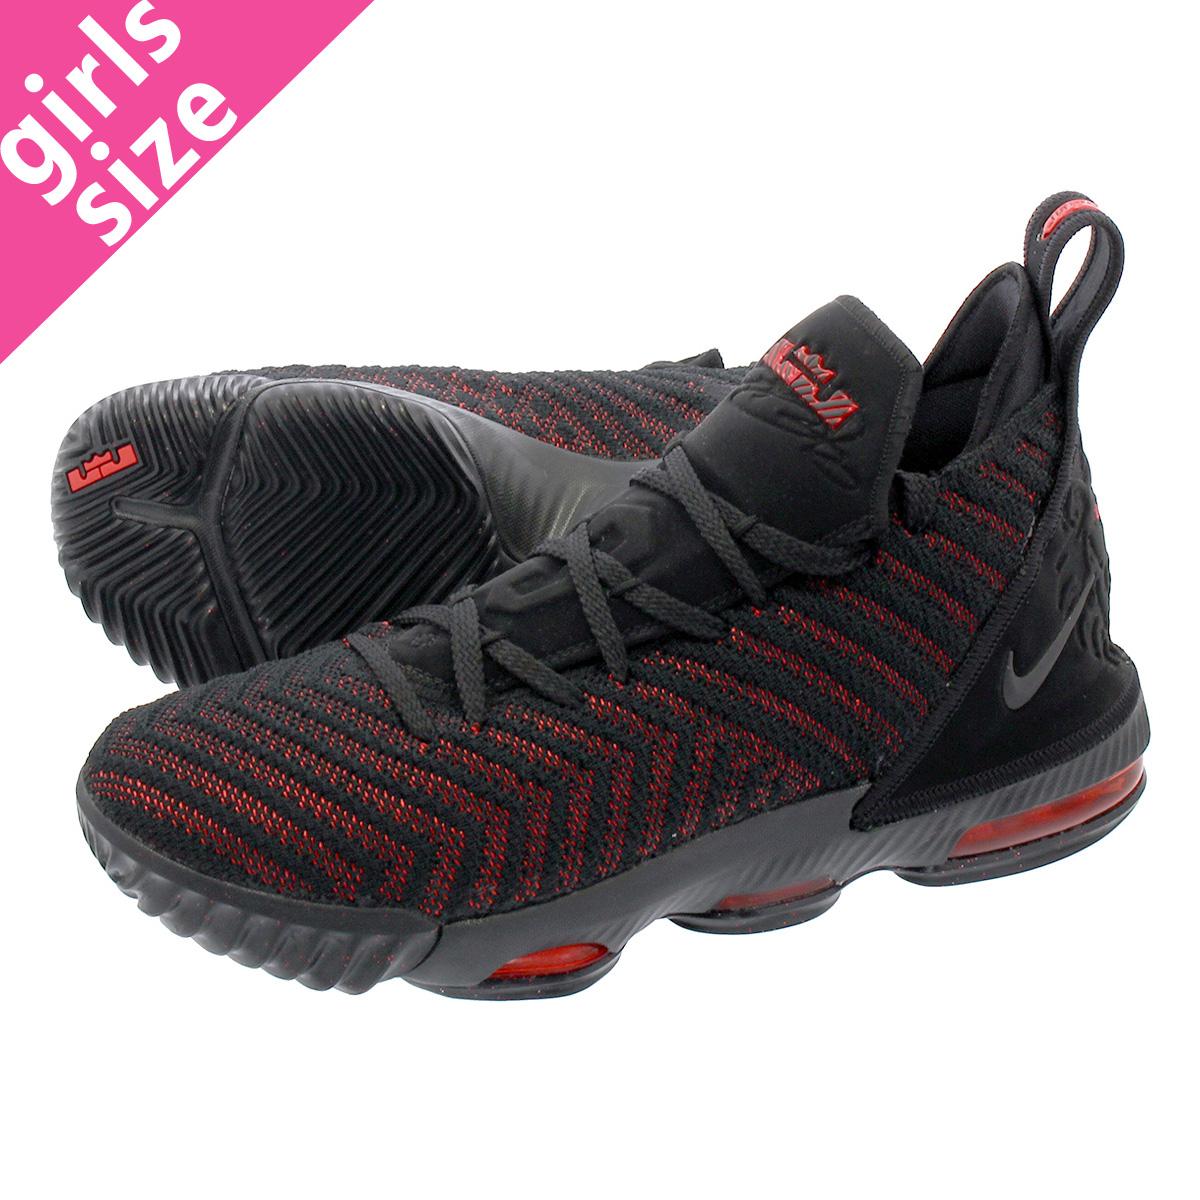 best cheap 86bbb 8af8a NIKE LEBRON 16 GS Nike Revlon 16 GS BLACK/UNIVERSITY RED aq2465-002